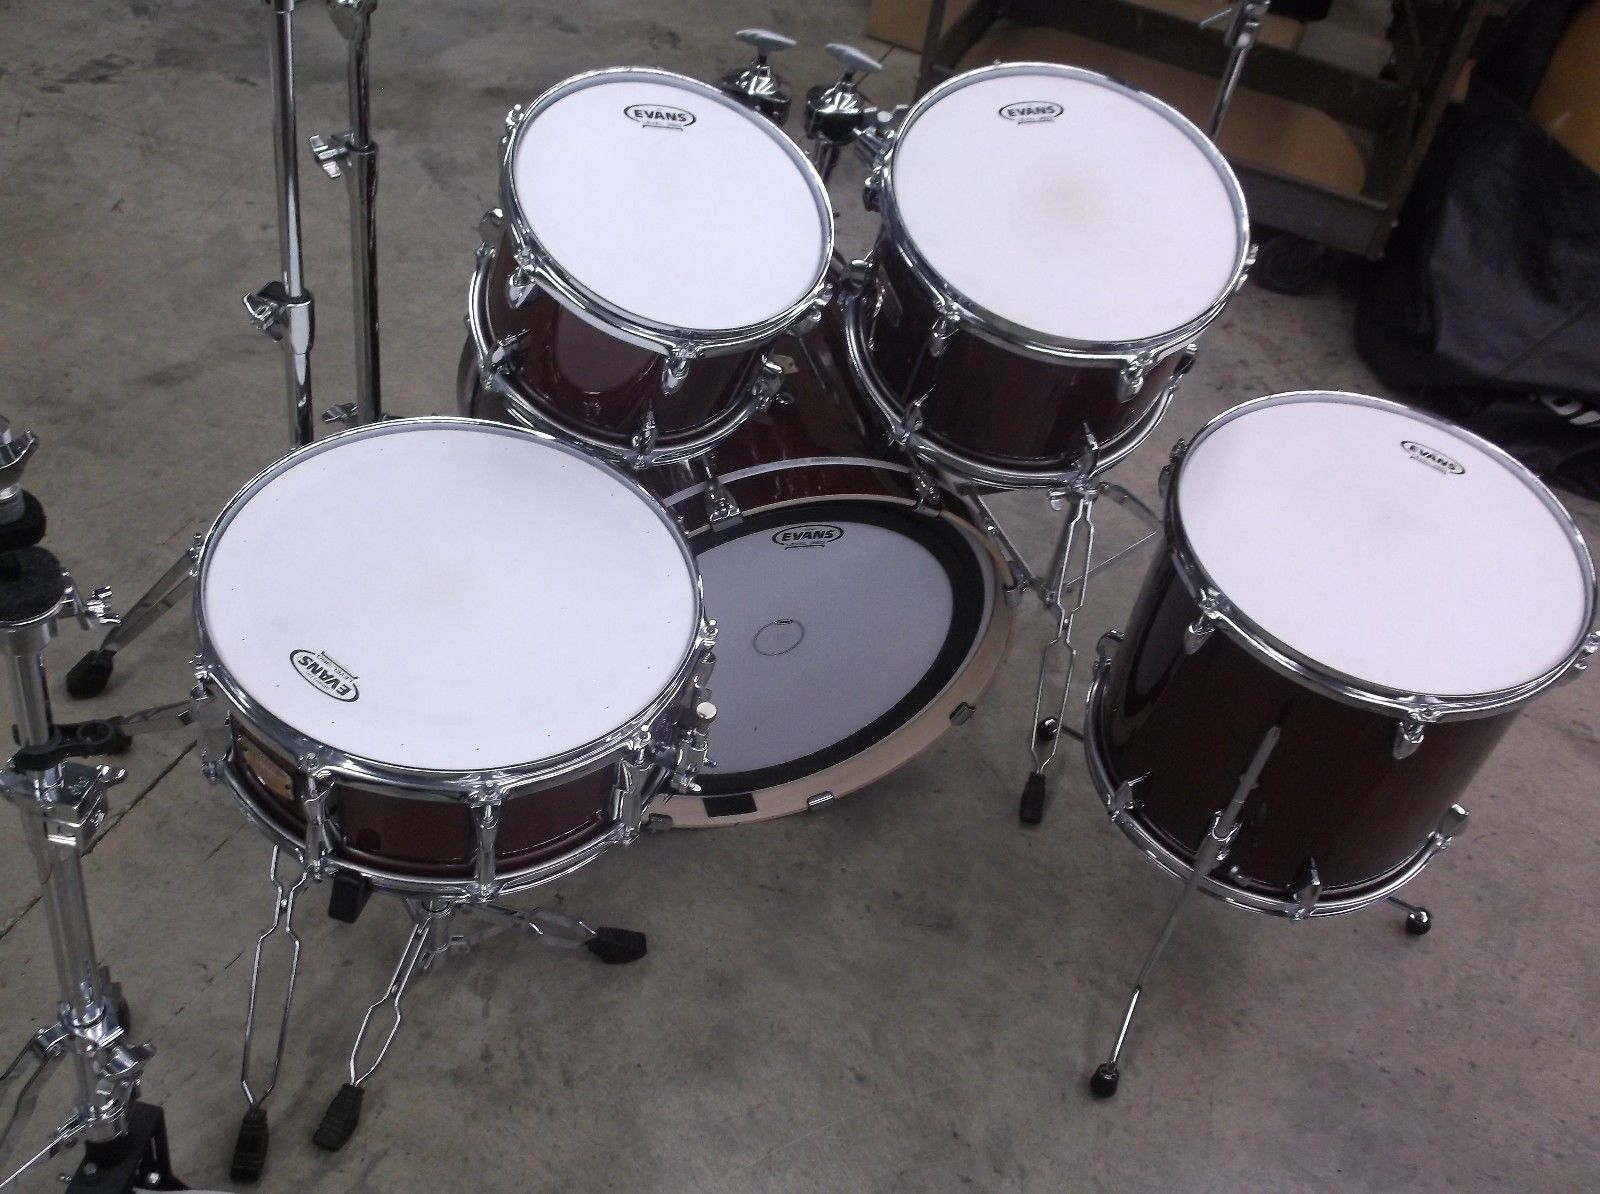 Yamaha Stage Custom Birch 5 Piece Drum Set 20 10 12 14 14 Plus